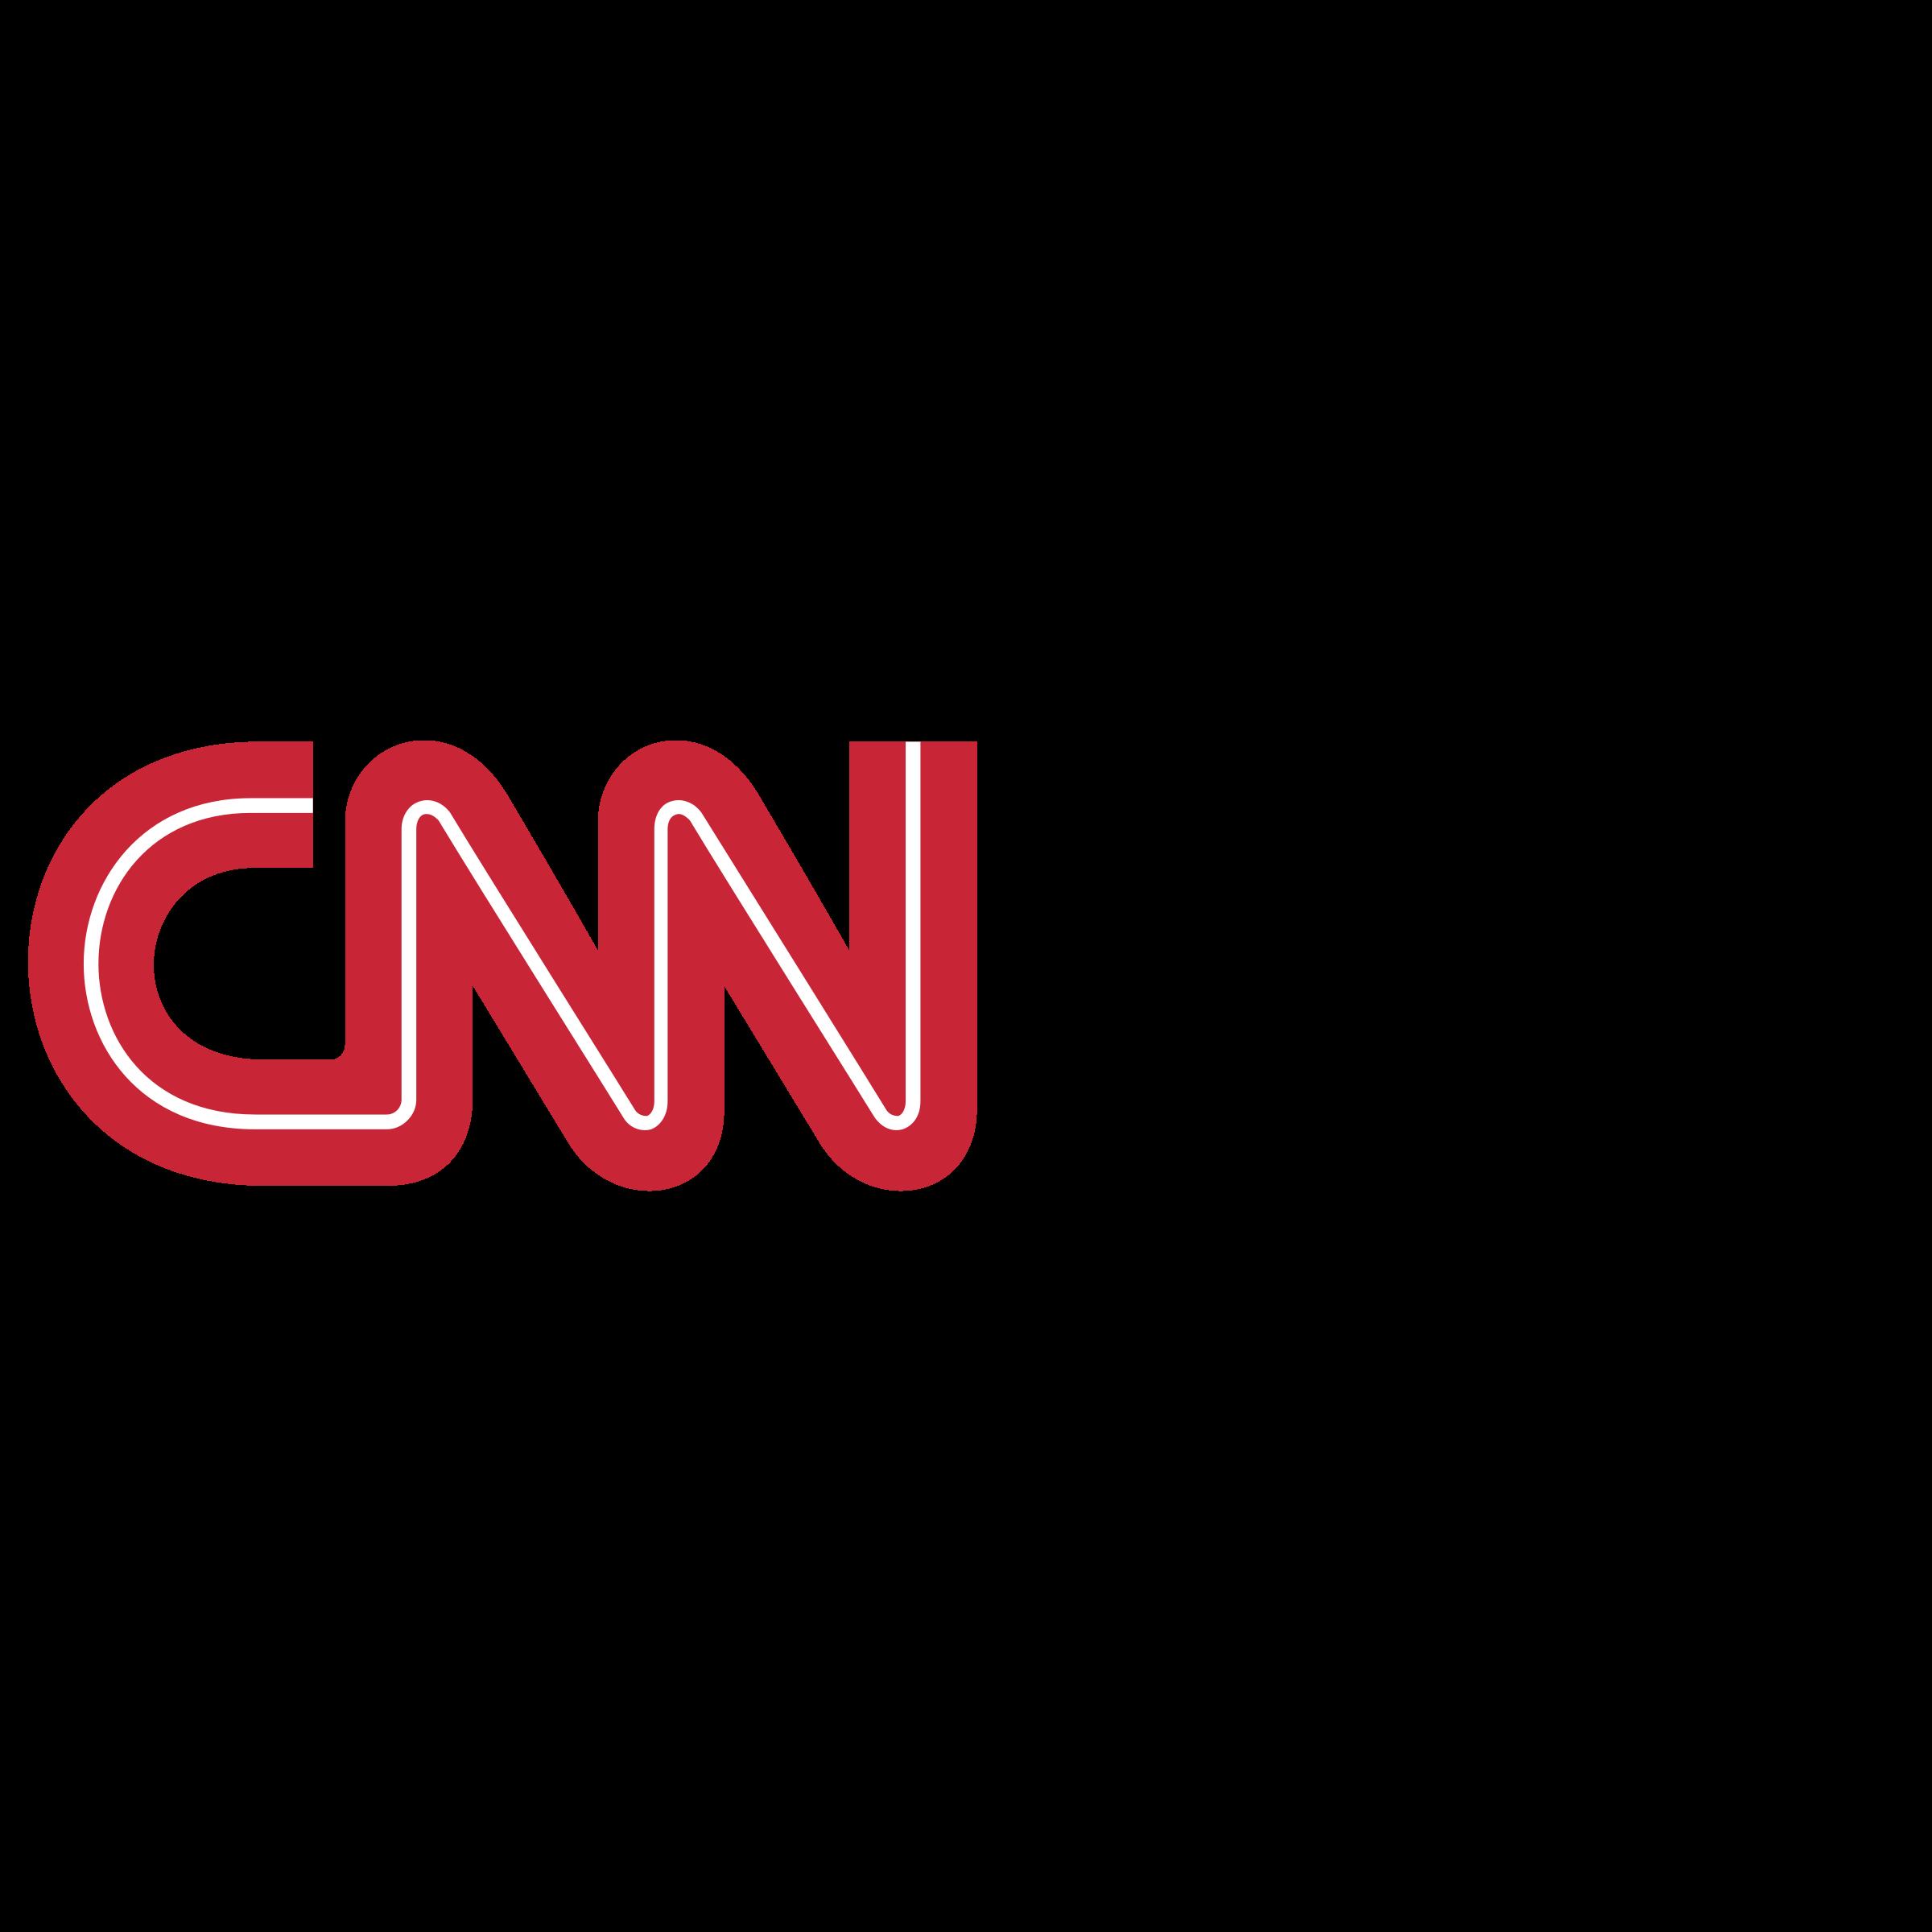 Cnn Com Logo Png Transparent & Svg Vector - Pluspng Pluspng.com - Cnn Logo PNG